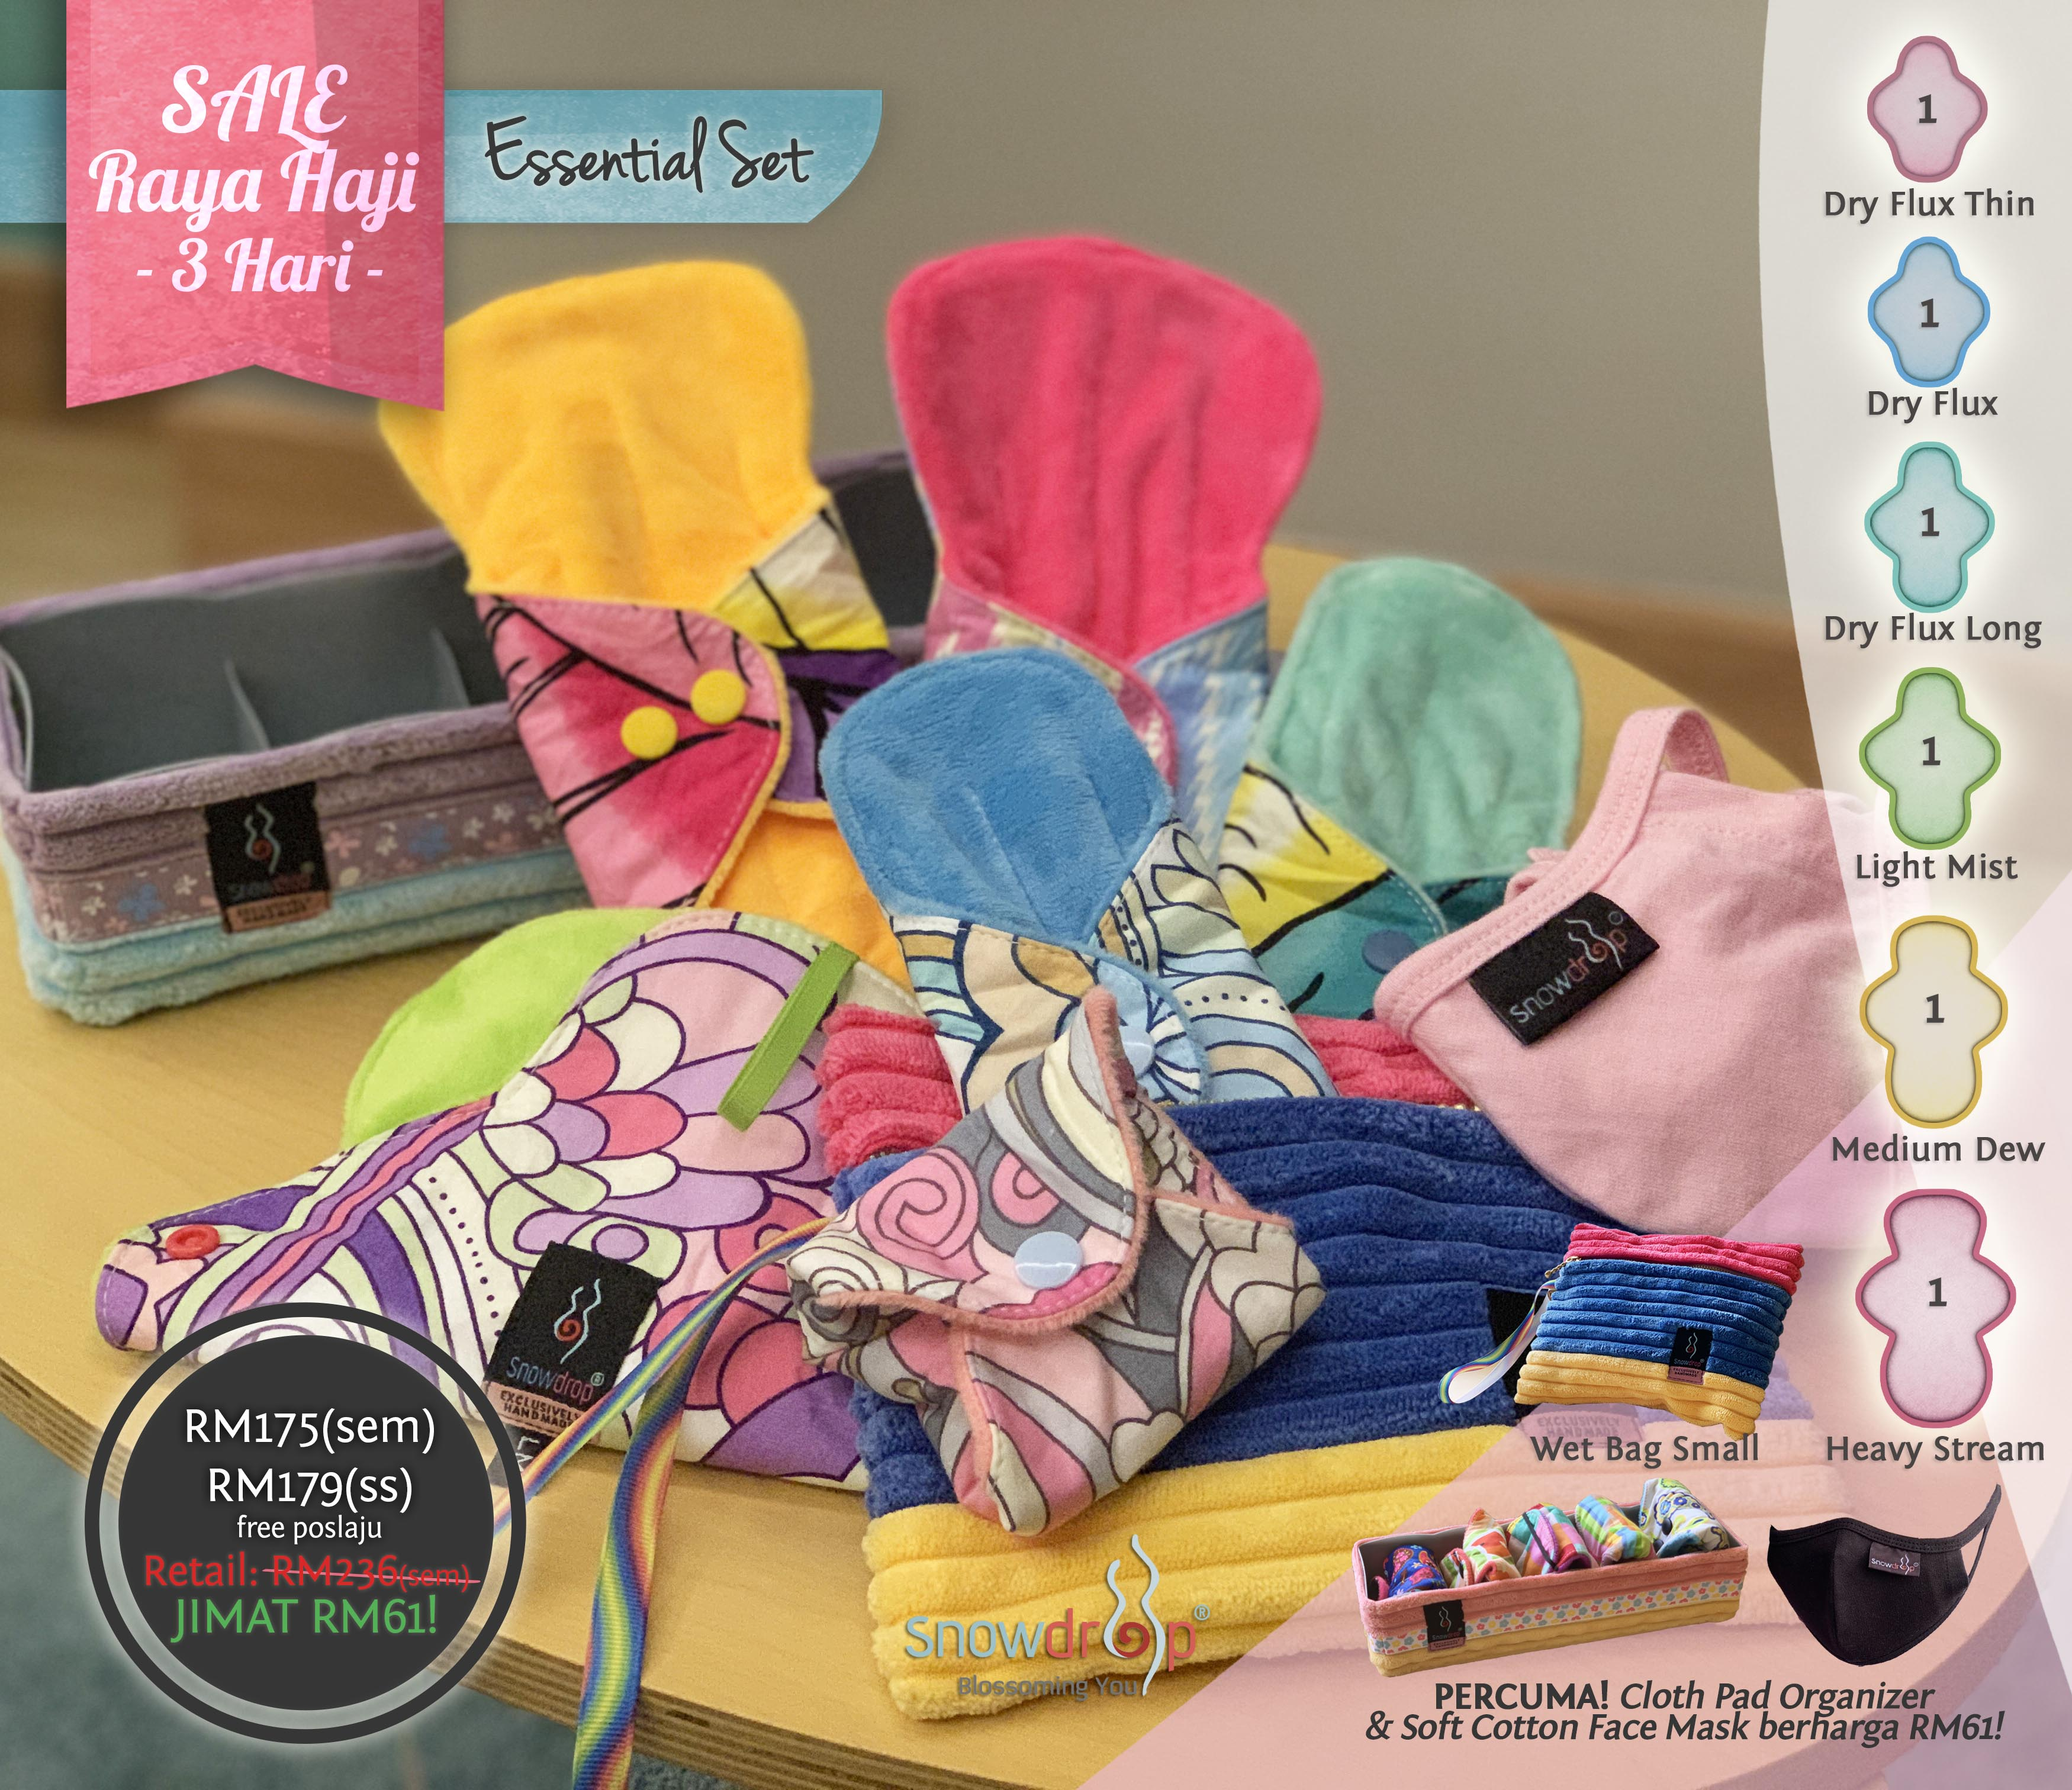 Pakej SALE Essential Set